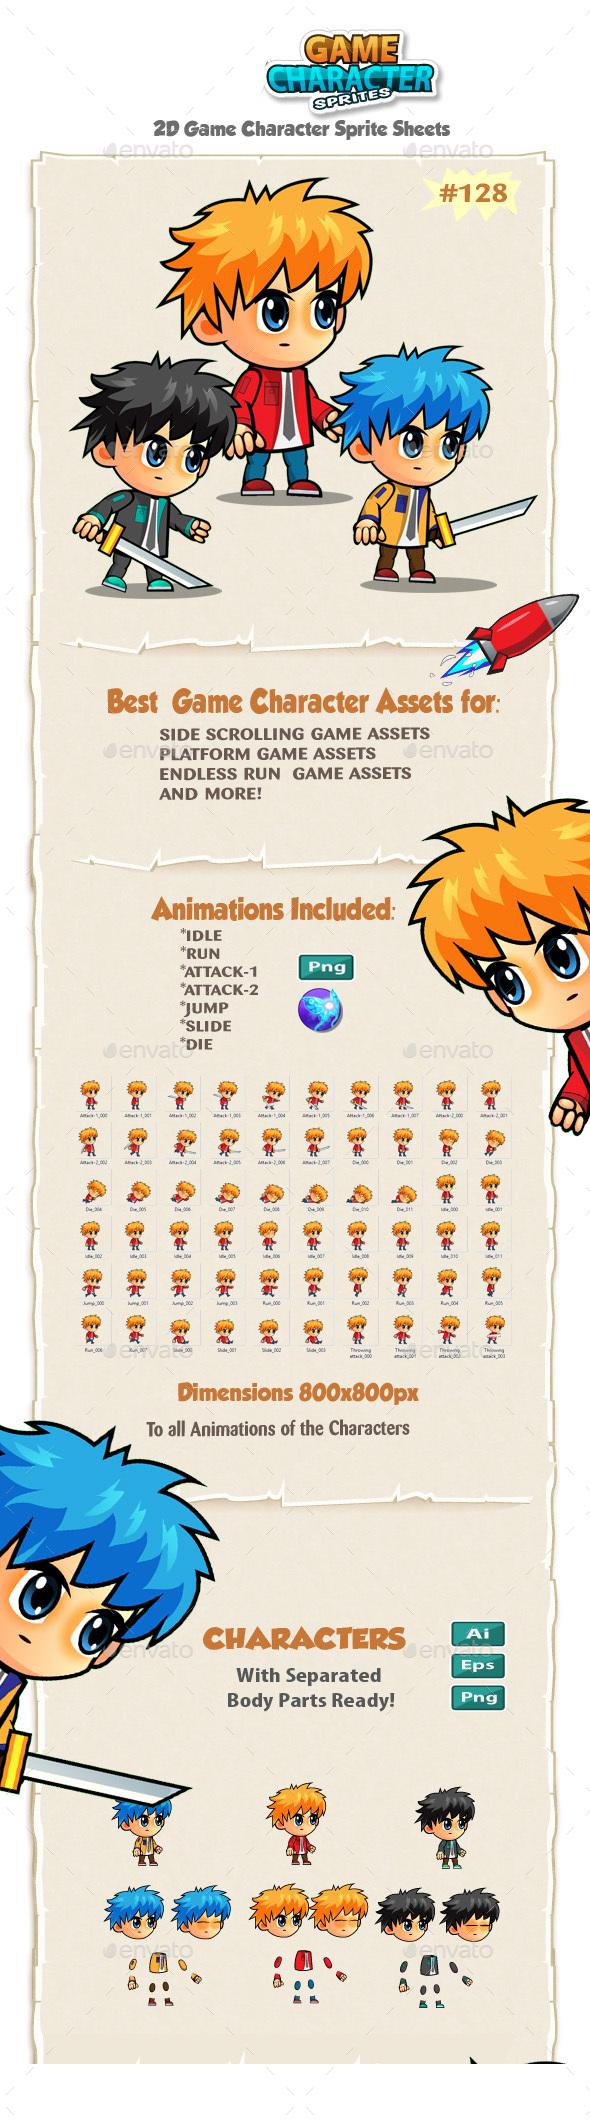 2D Game Character Sprites 128 - Sprites Game Assets